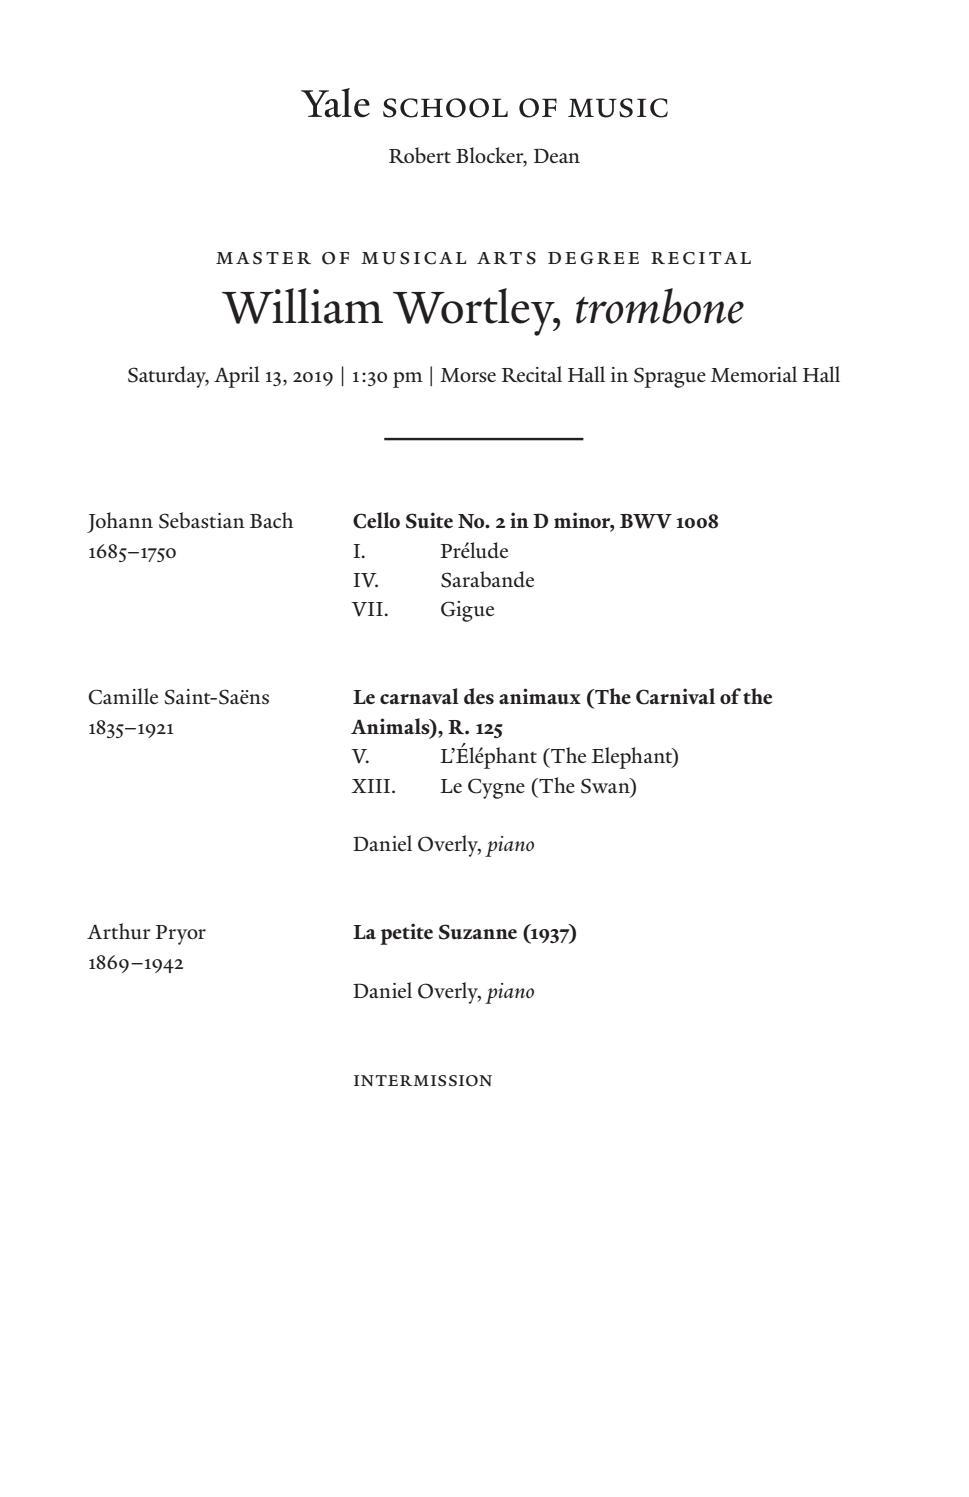 William Wortley, trombone, April 13, 2019 by Yale School of